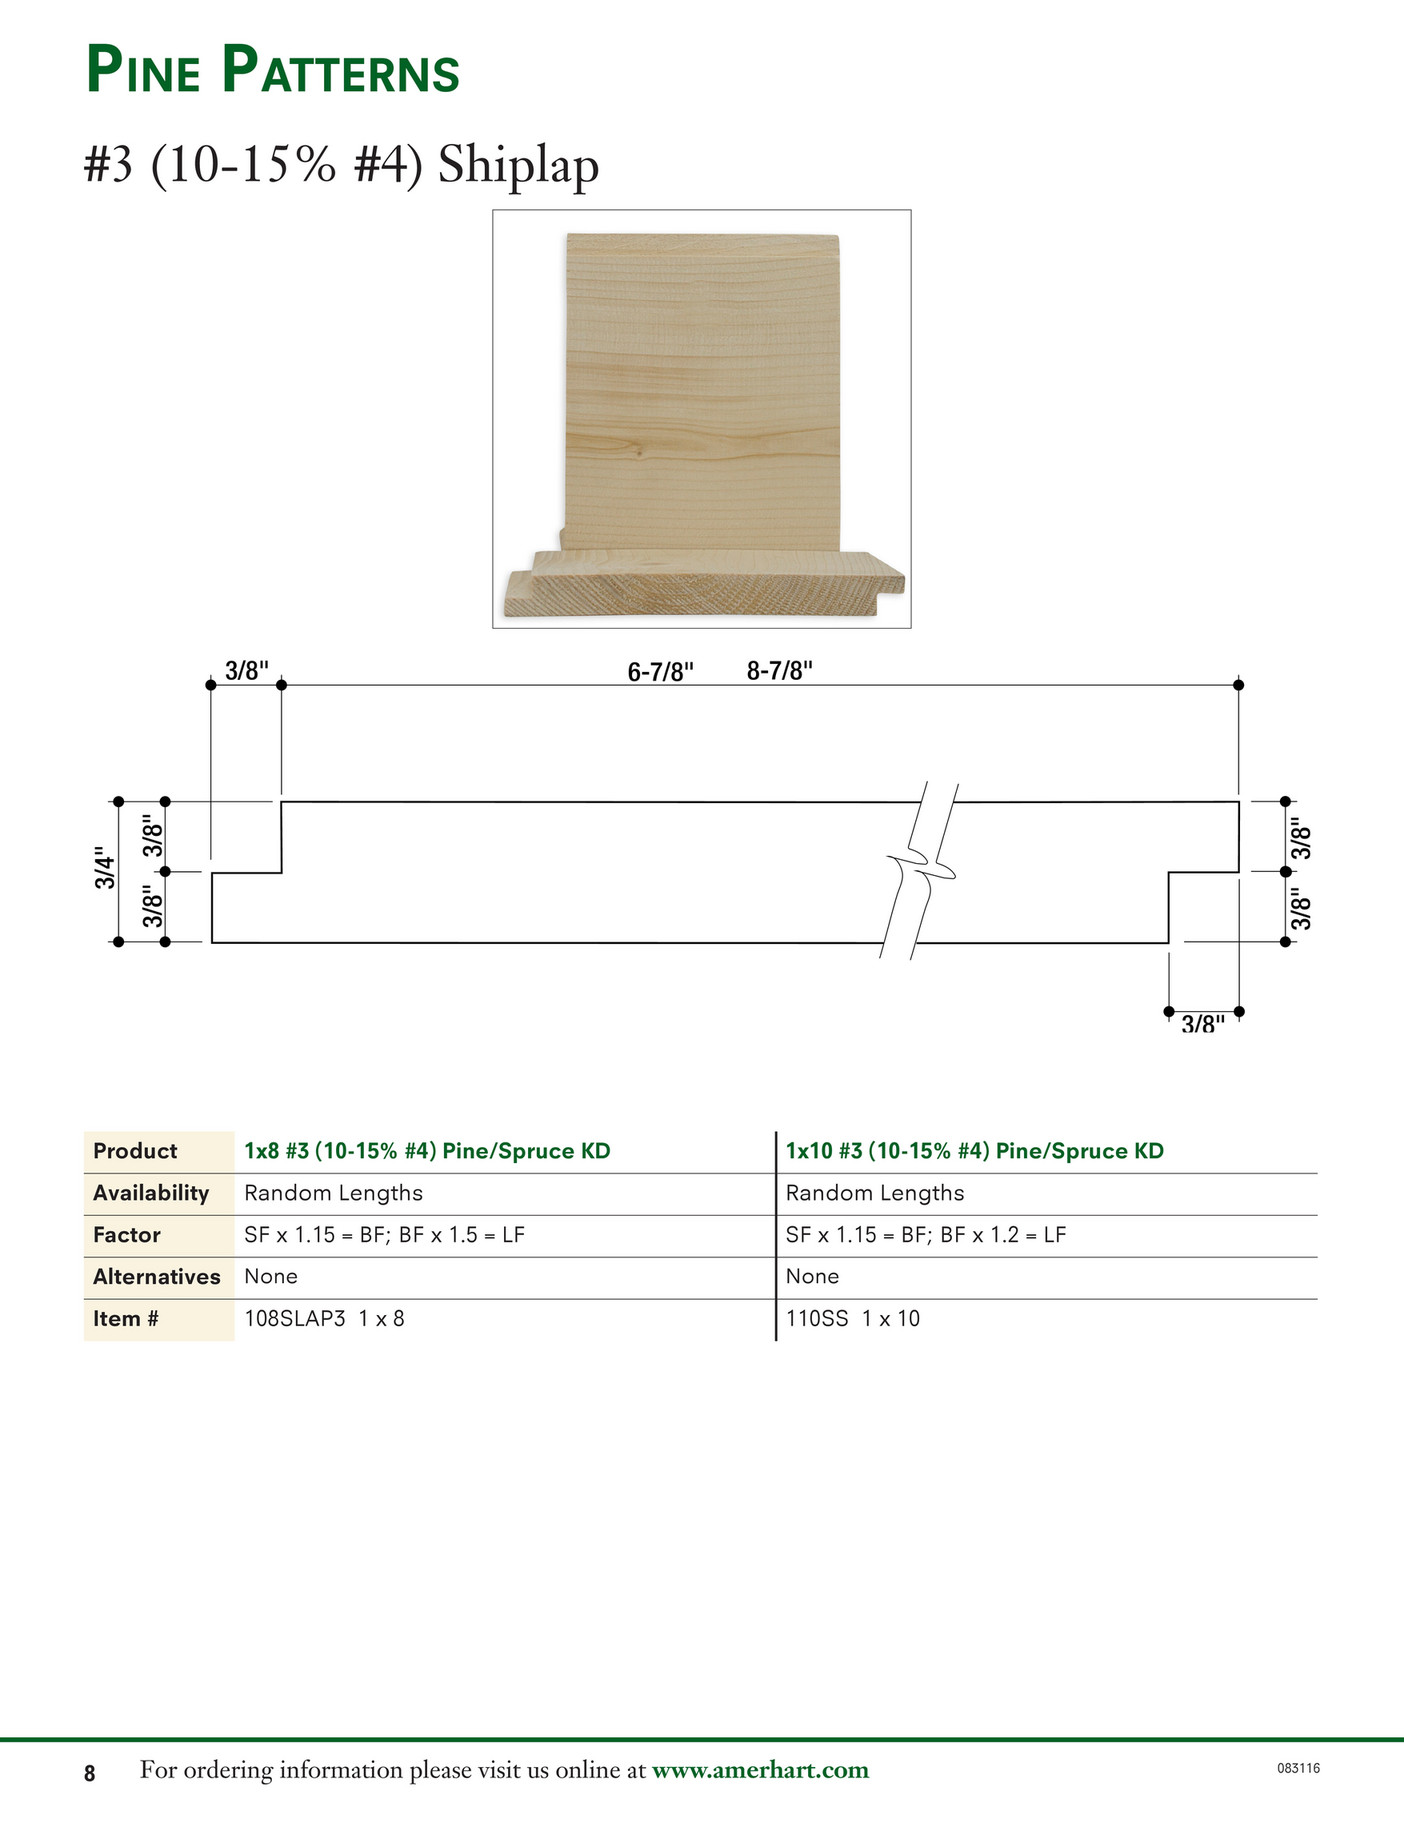 Amerhart | Wood Specialties Catalog 2016 - Page 10-11